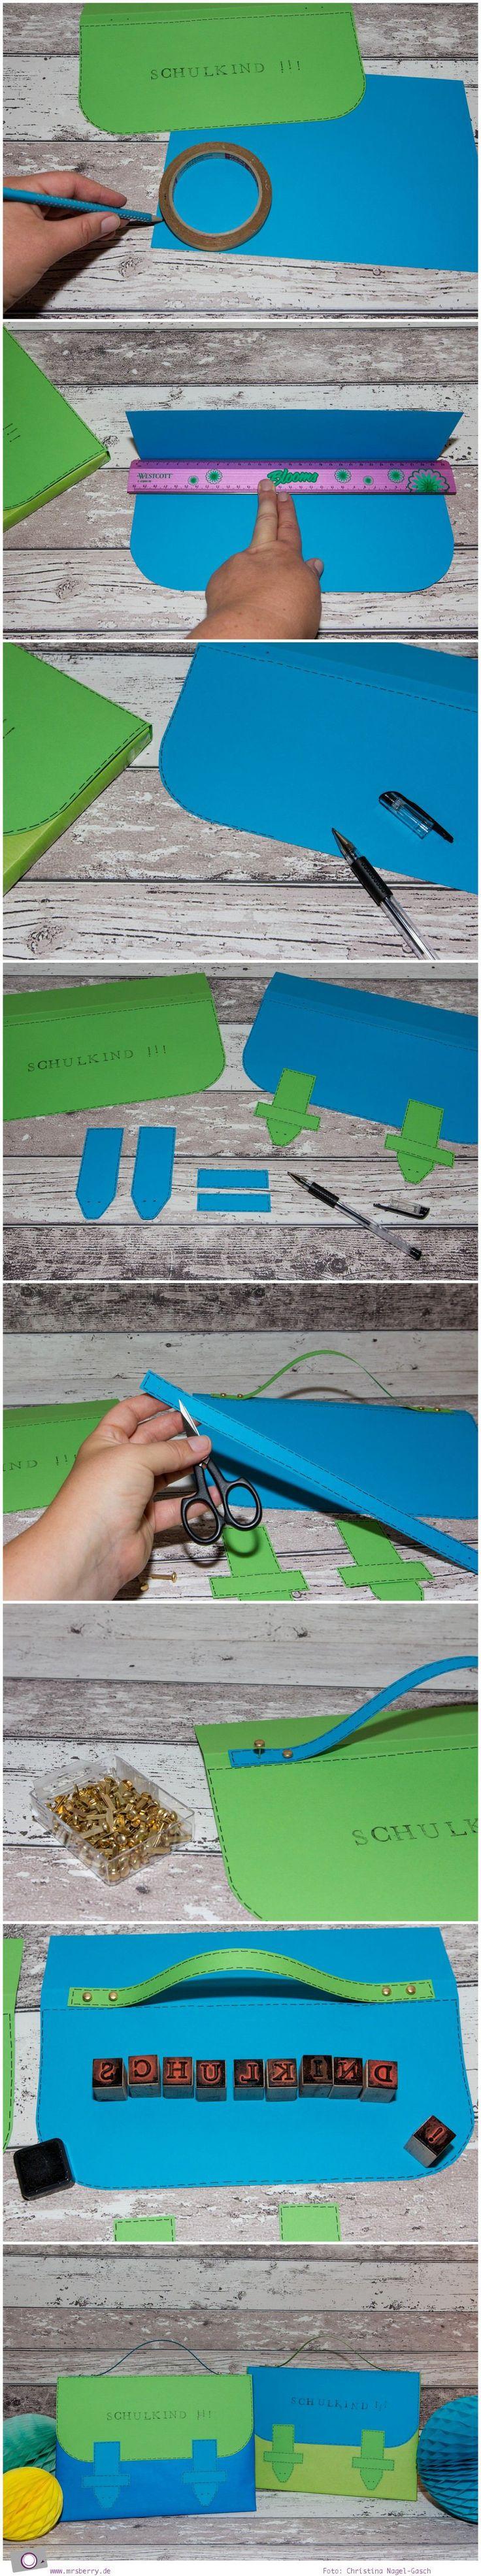 Step-by-Step Tutorial: Buch als Schulranzen zum Schulanfang verpacken…